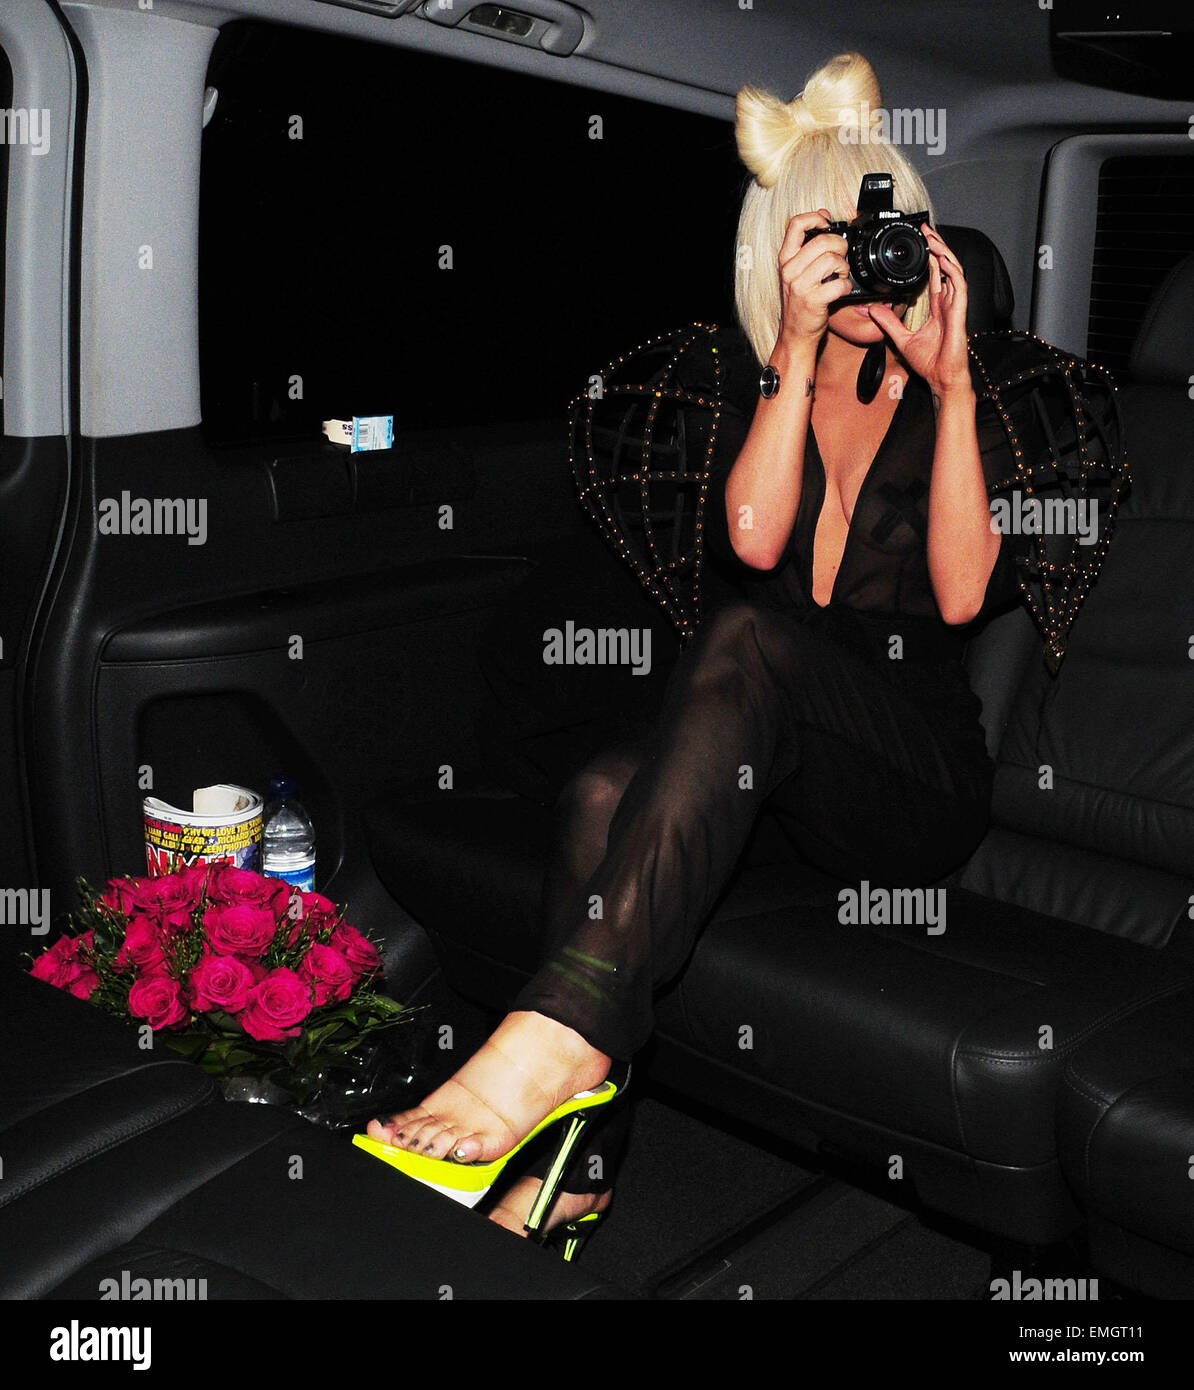 16.APRIL.2009 - LONDON  US POP SENSATION LADY GAGA LEAVING THE BBC TV STUDIOS AFTER APPEARING ON THE JONATHON ROSS - Stock Image